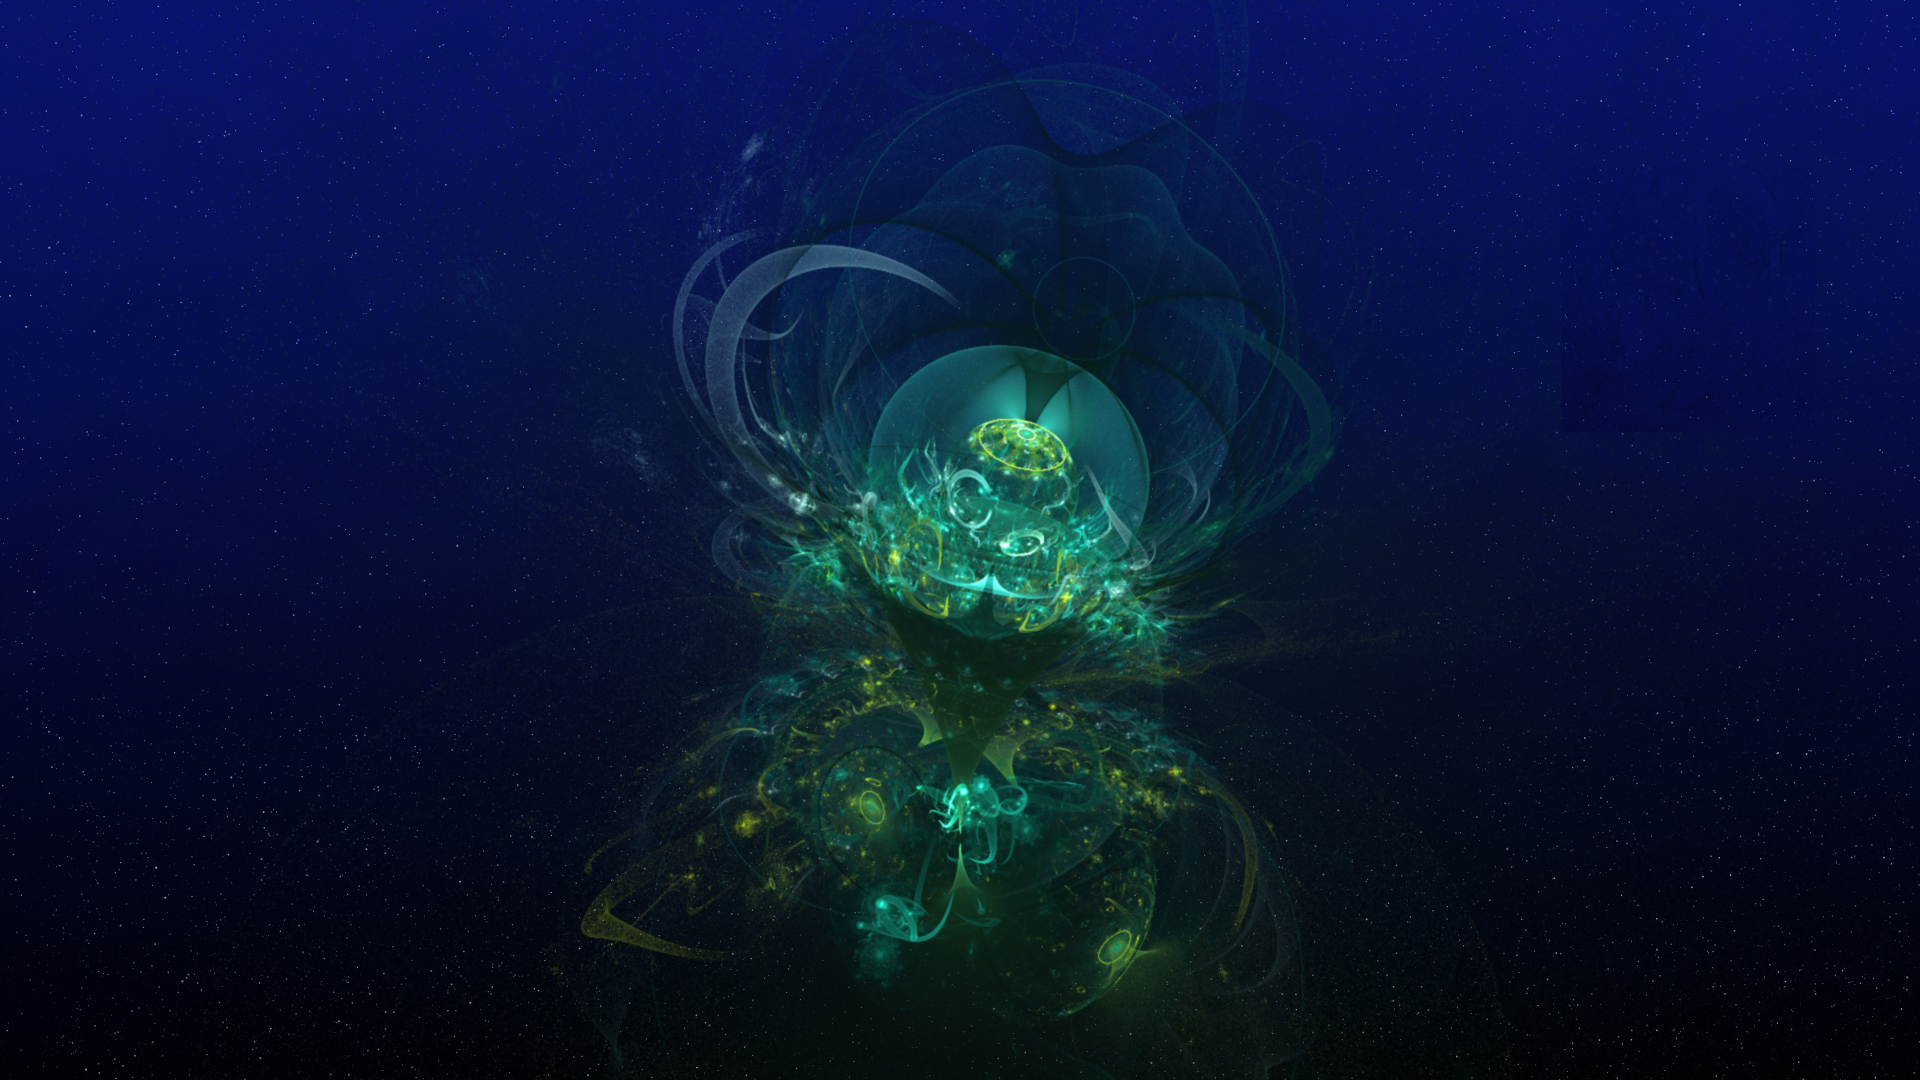 Deep Ocean wallpaper   659261 1920x1080